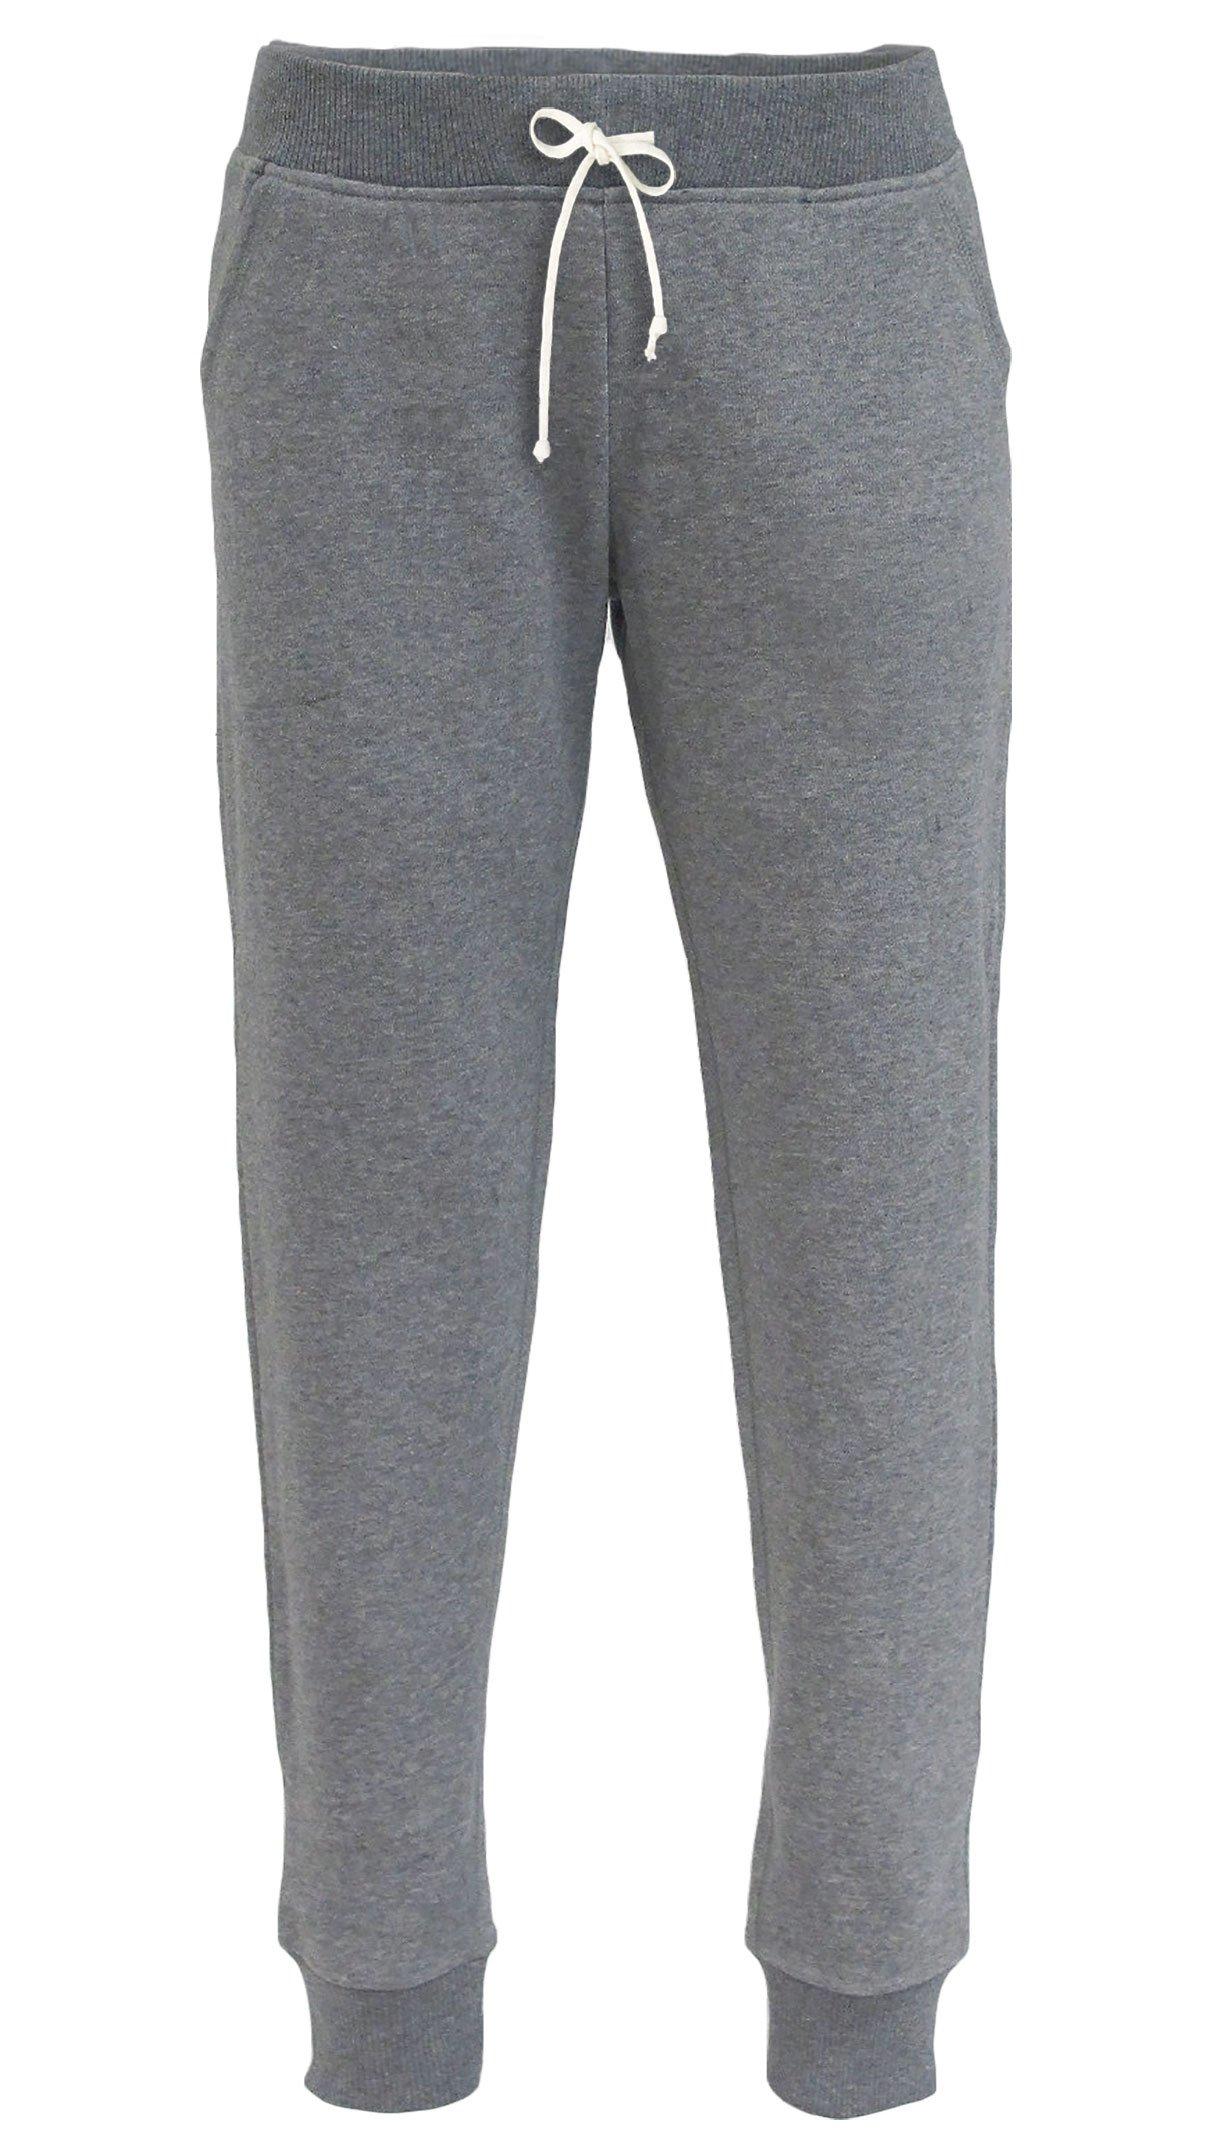 Womens Jogger Sweatpants